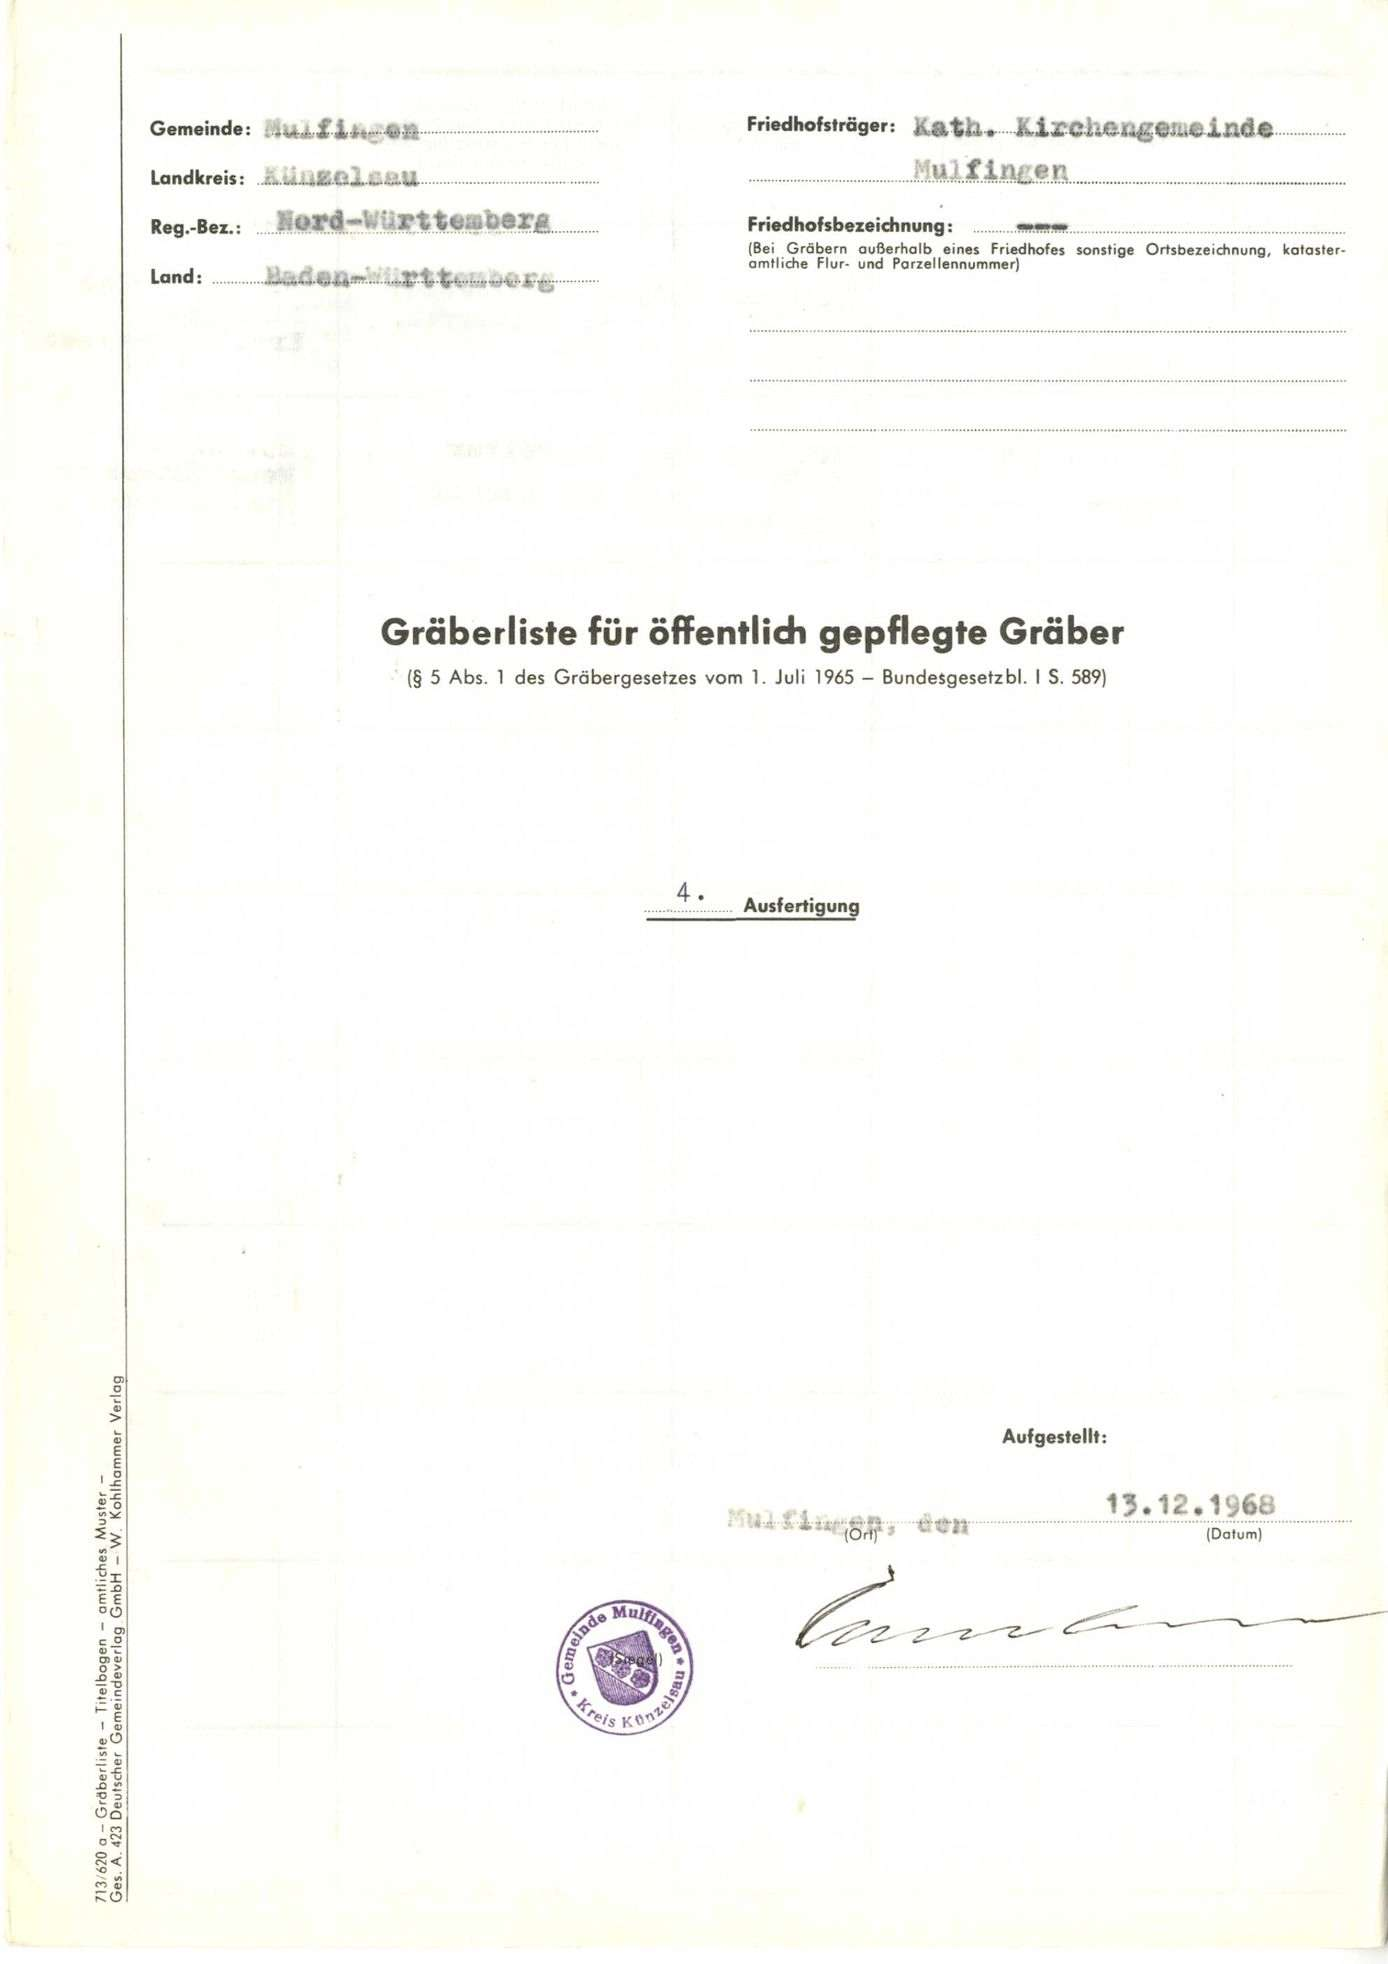 Mulfingen, Bild 1